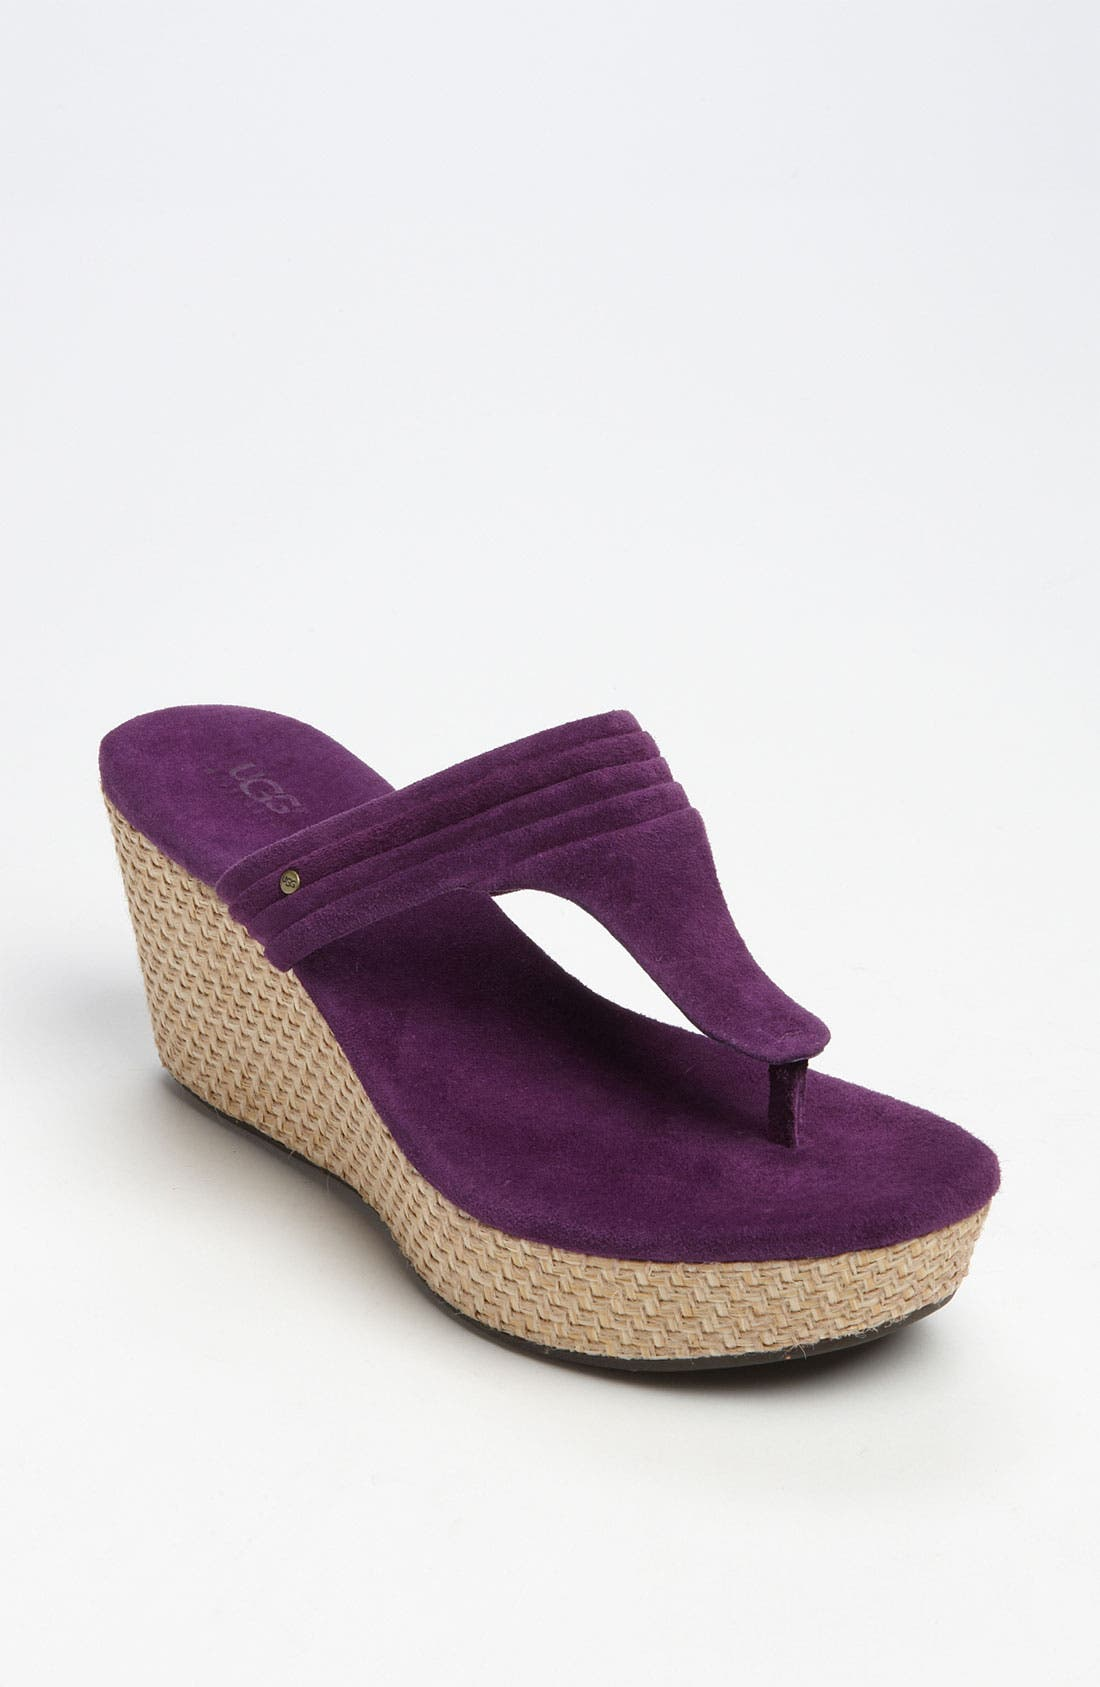 Alternate Image 1 Selected - UGG® Australia 'Zamora' Wedge Sandal